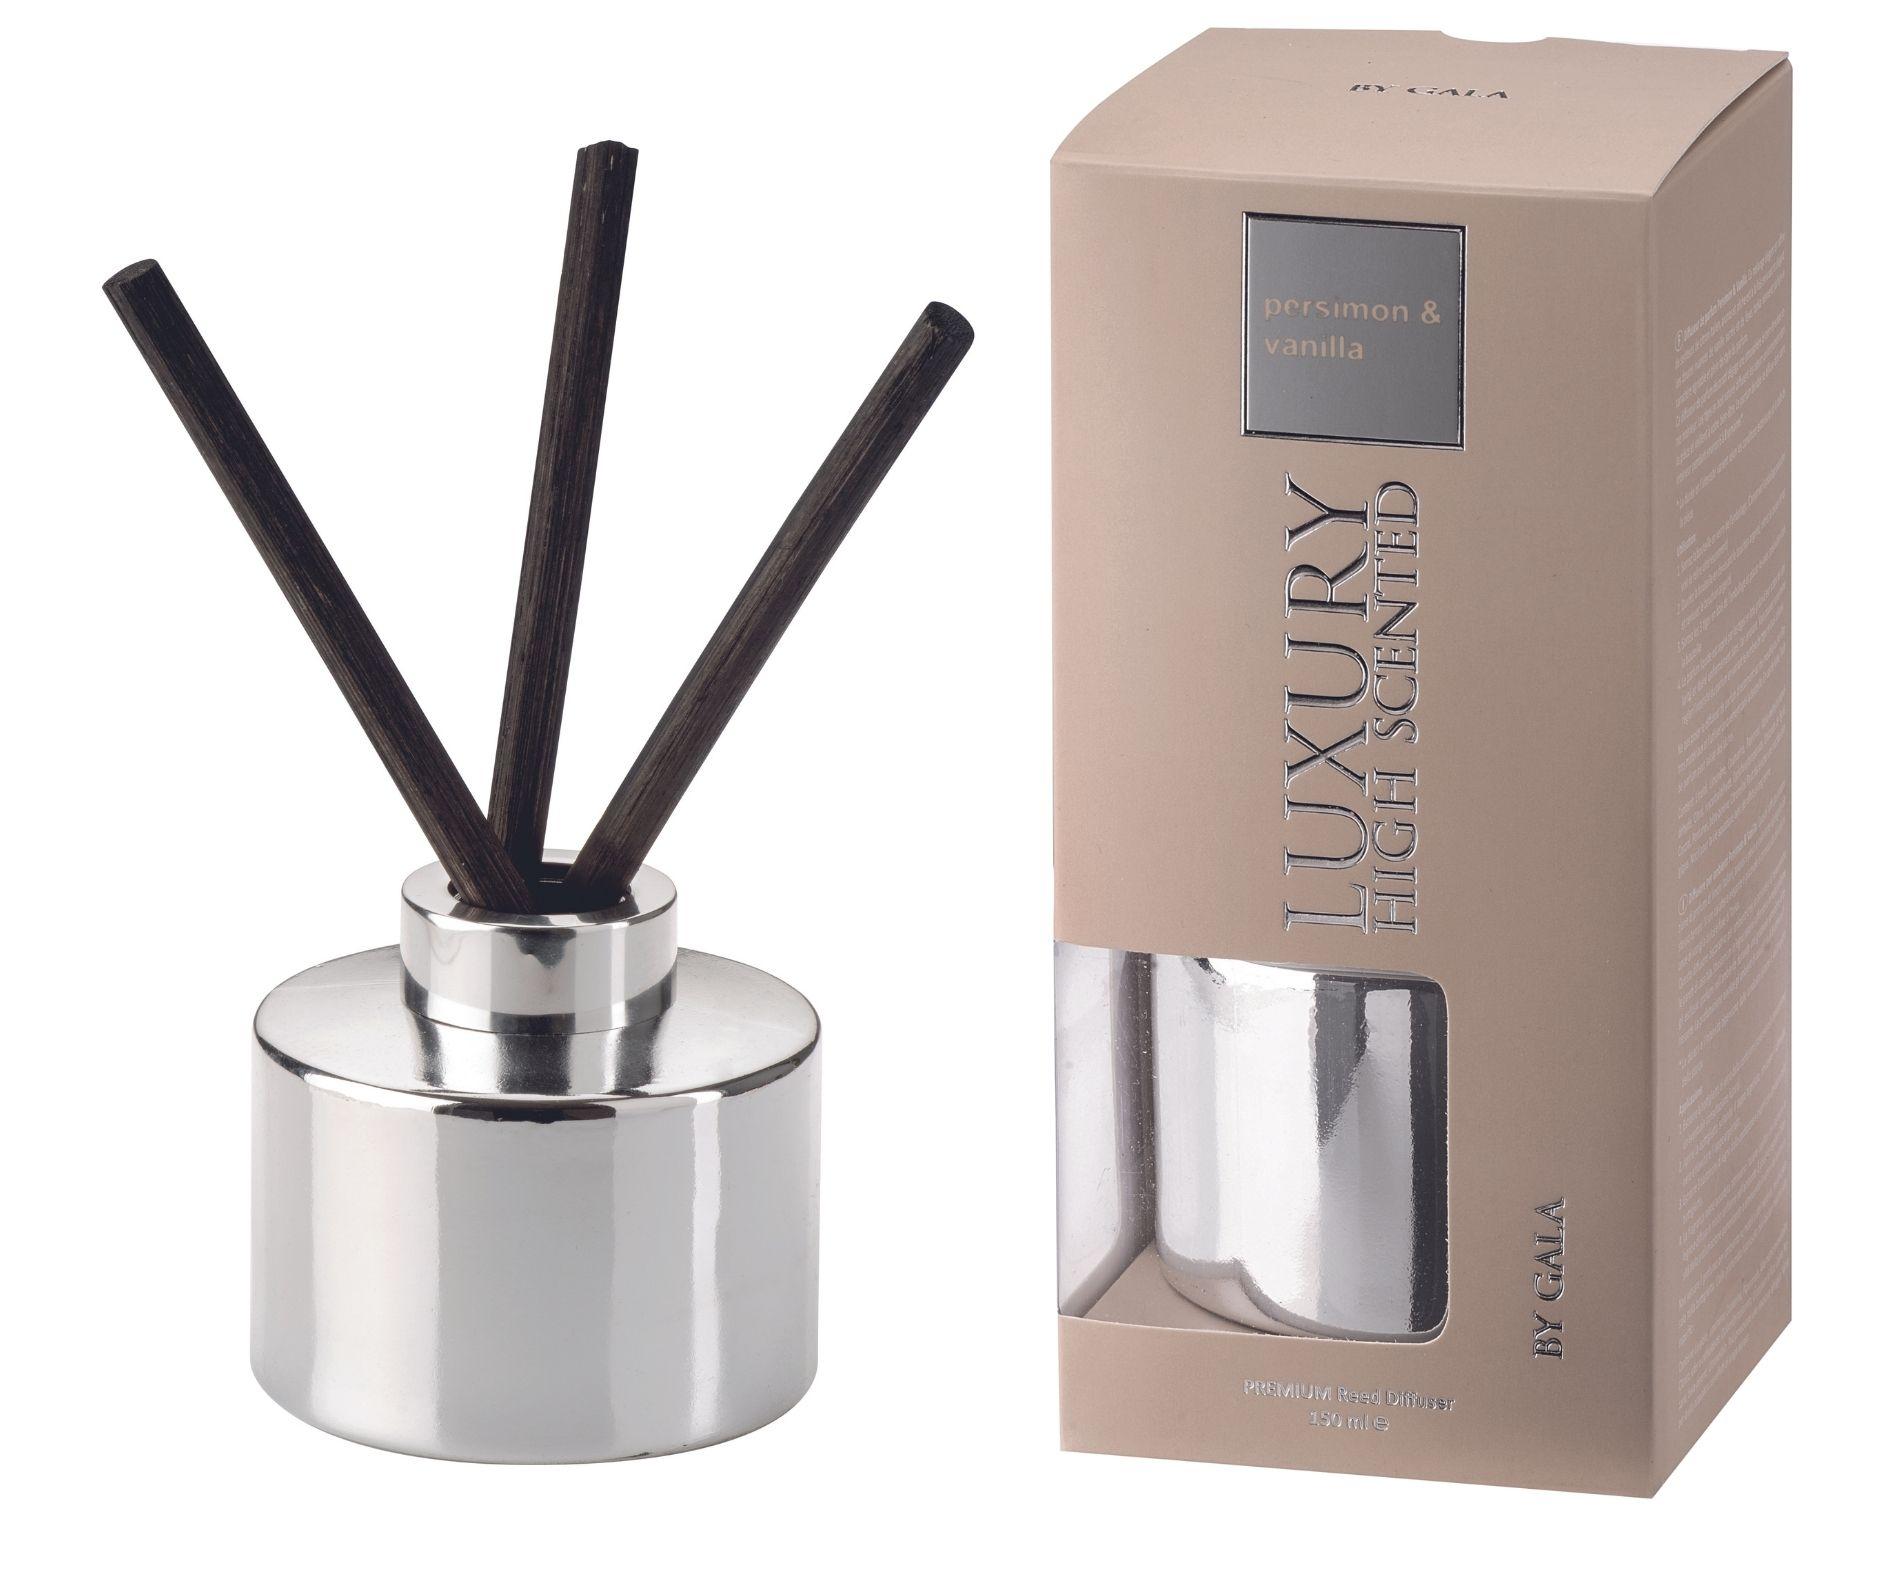 Difuzér Luxury Persimon & Vanilla 150 ml, 3 tyčinky v ceně Gala kerzen